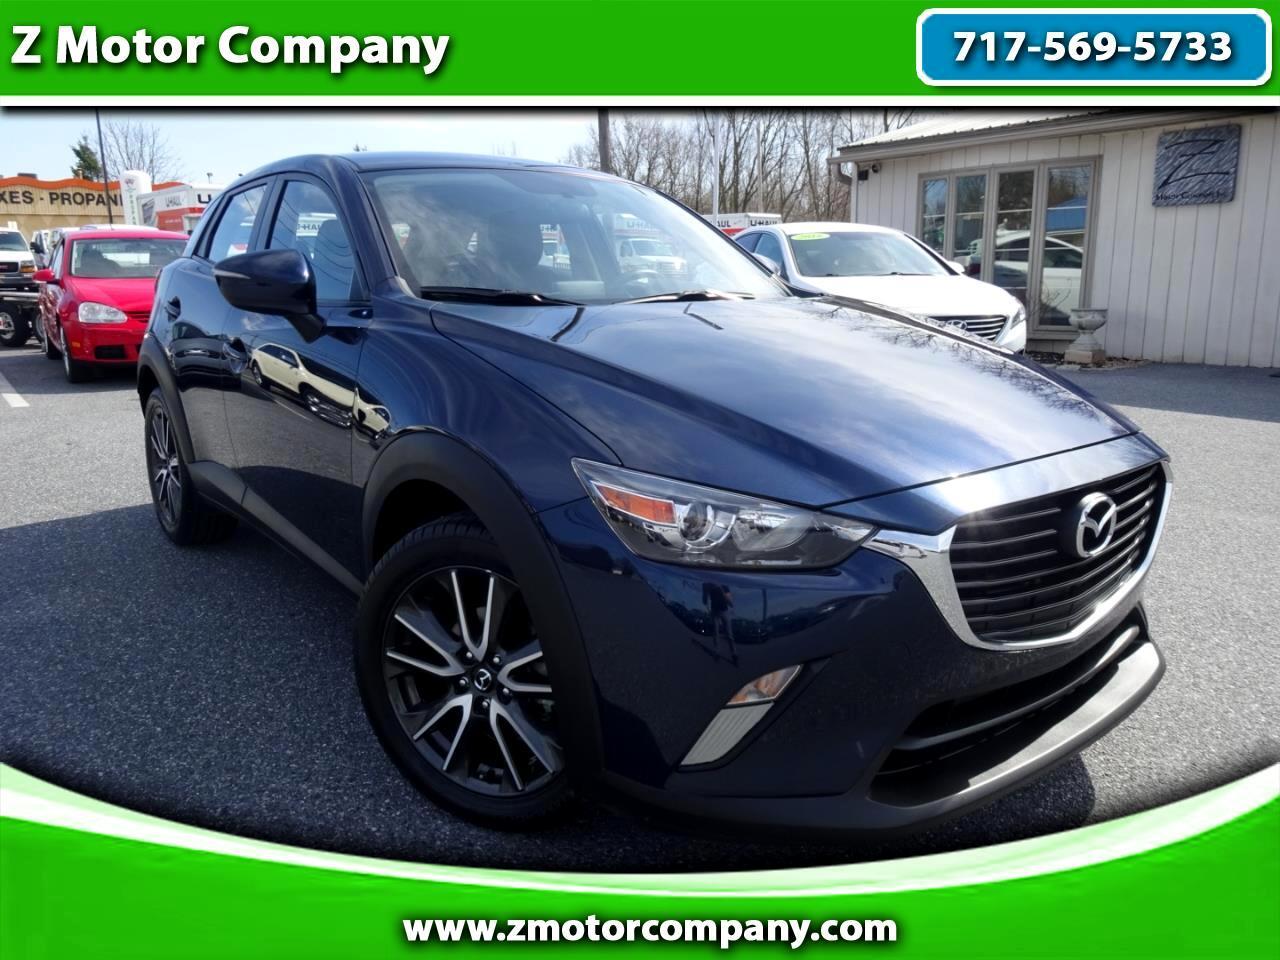 2017 Mazda CX-3 Touring FWD